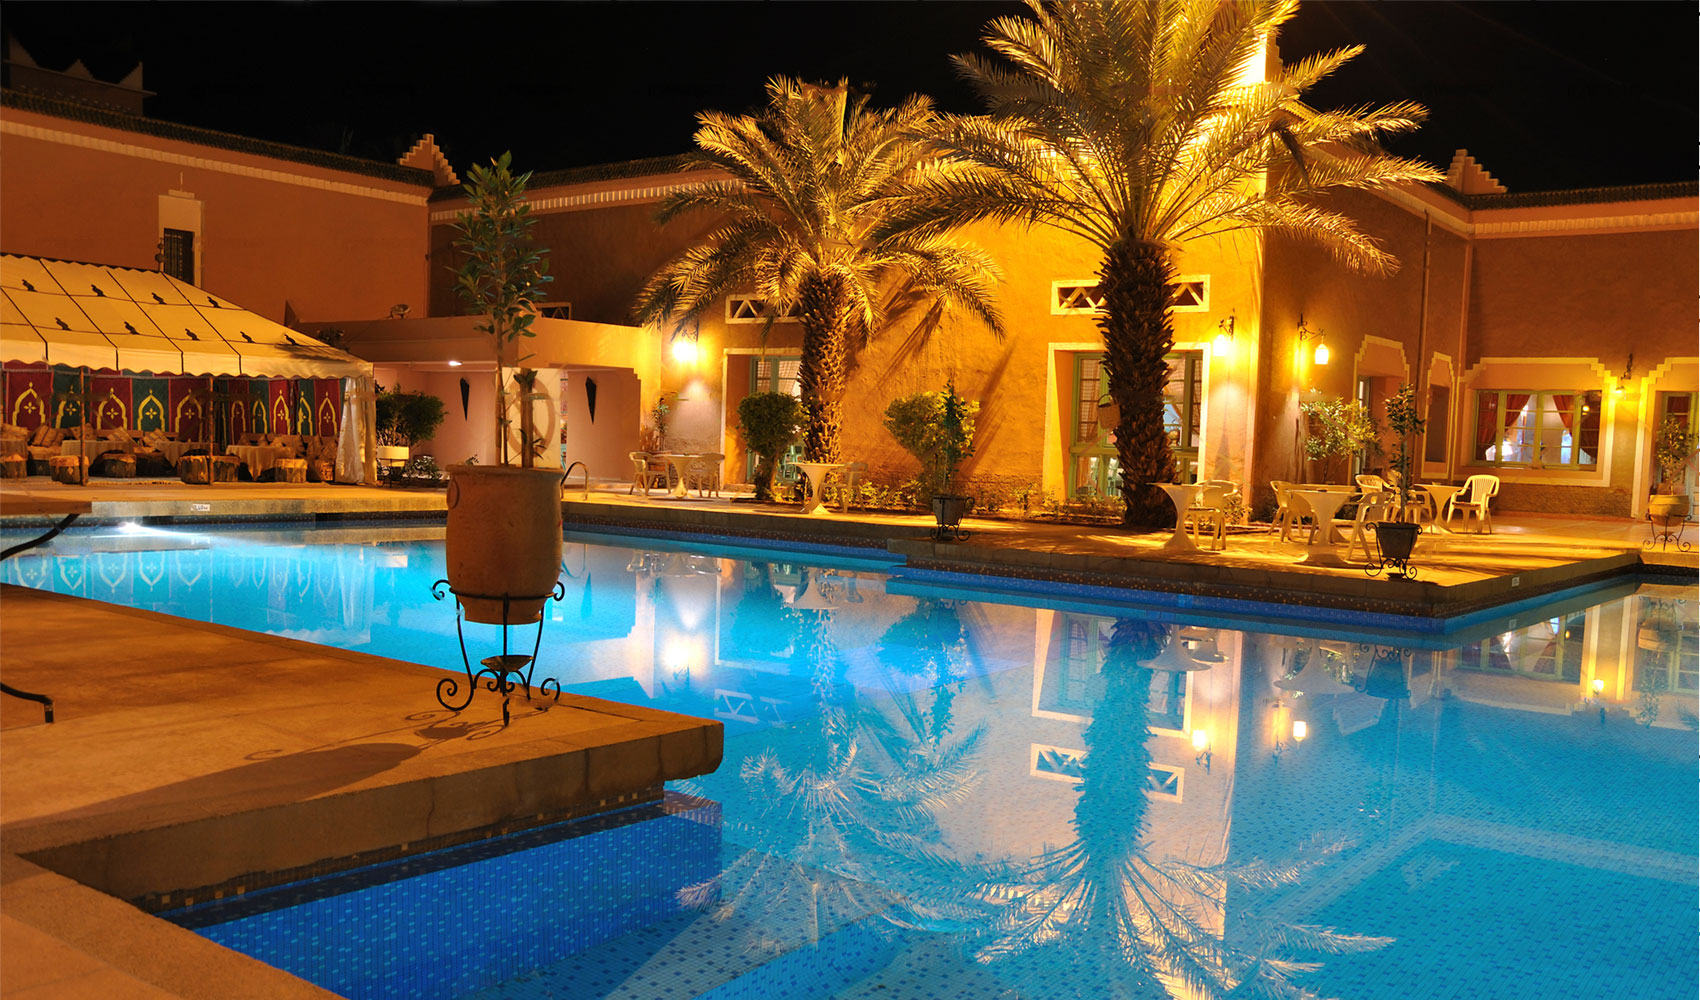 www.hotelinvest.ro piscina hotel spa sauna pensiune